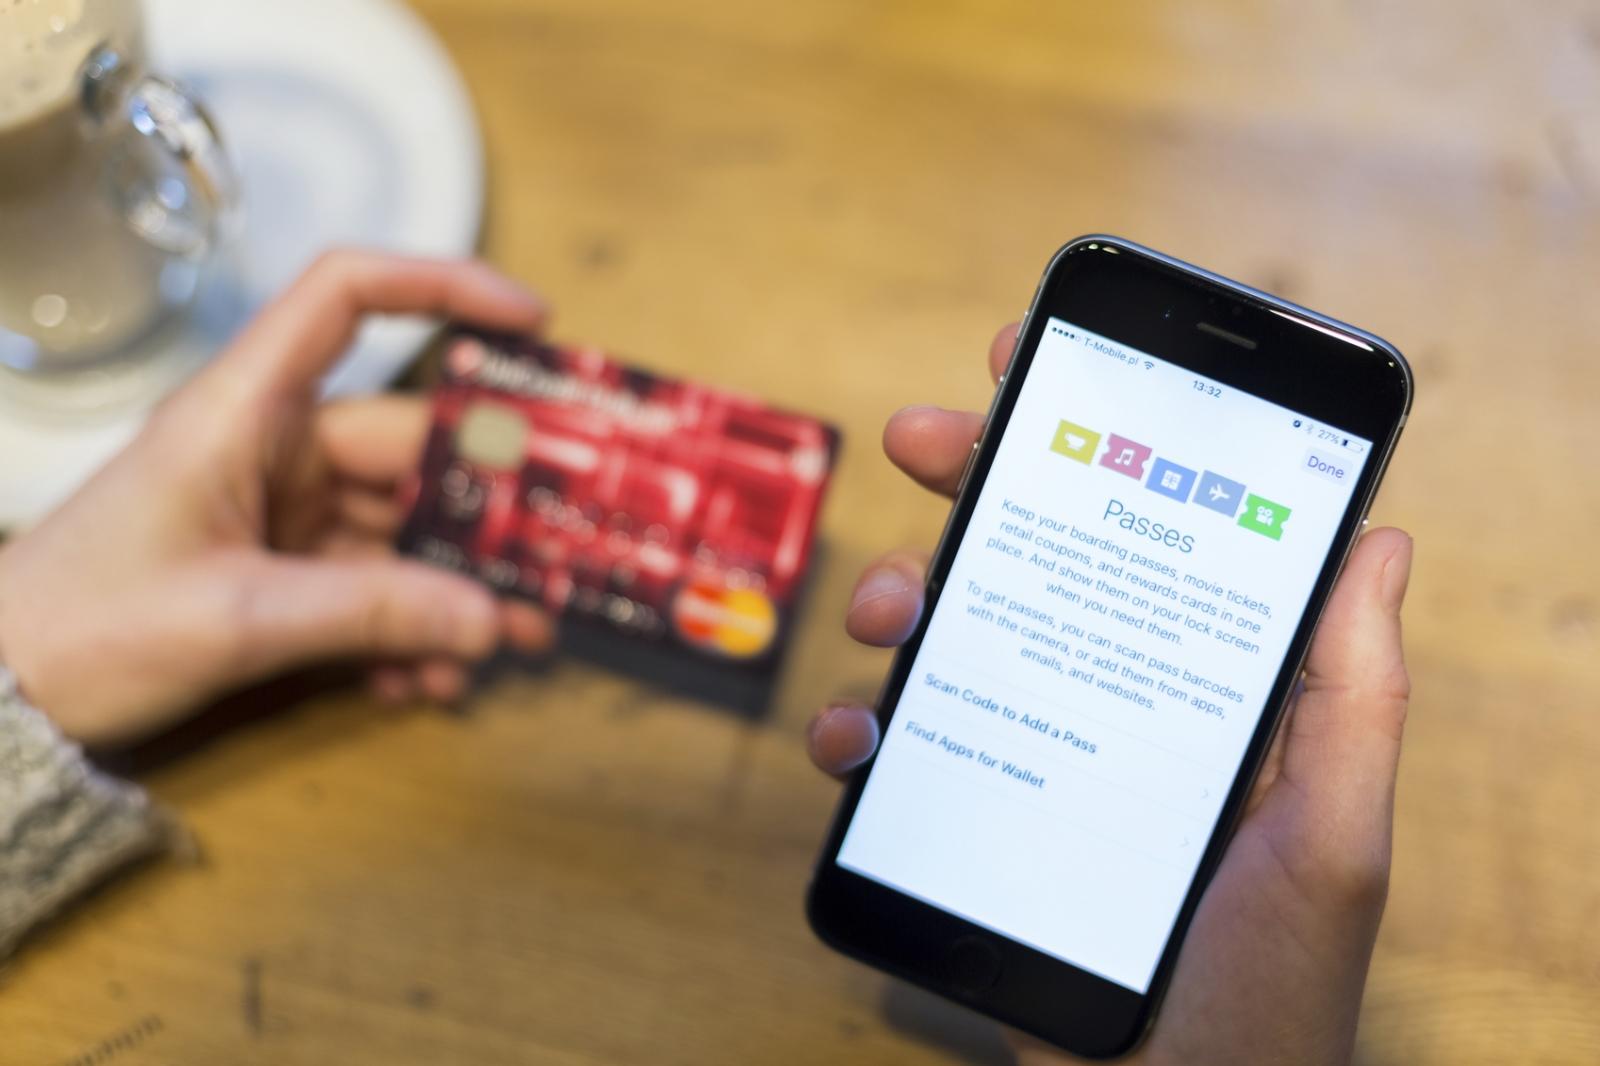 Entering sensitive data on a smartphone screen